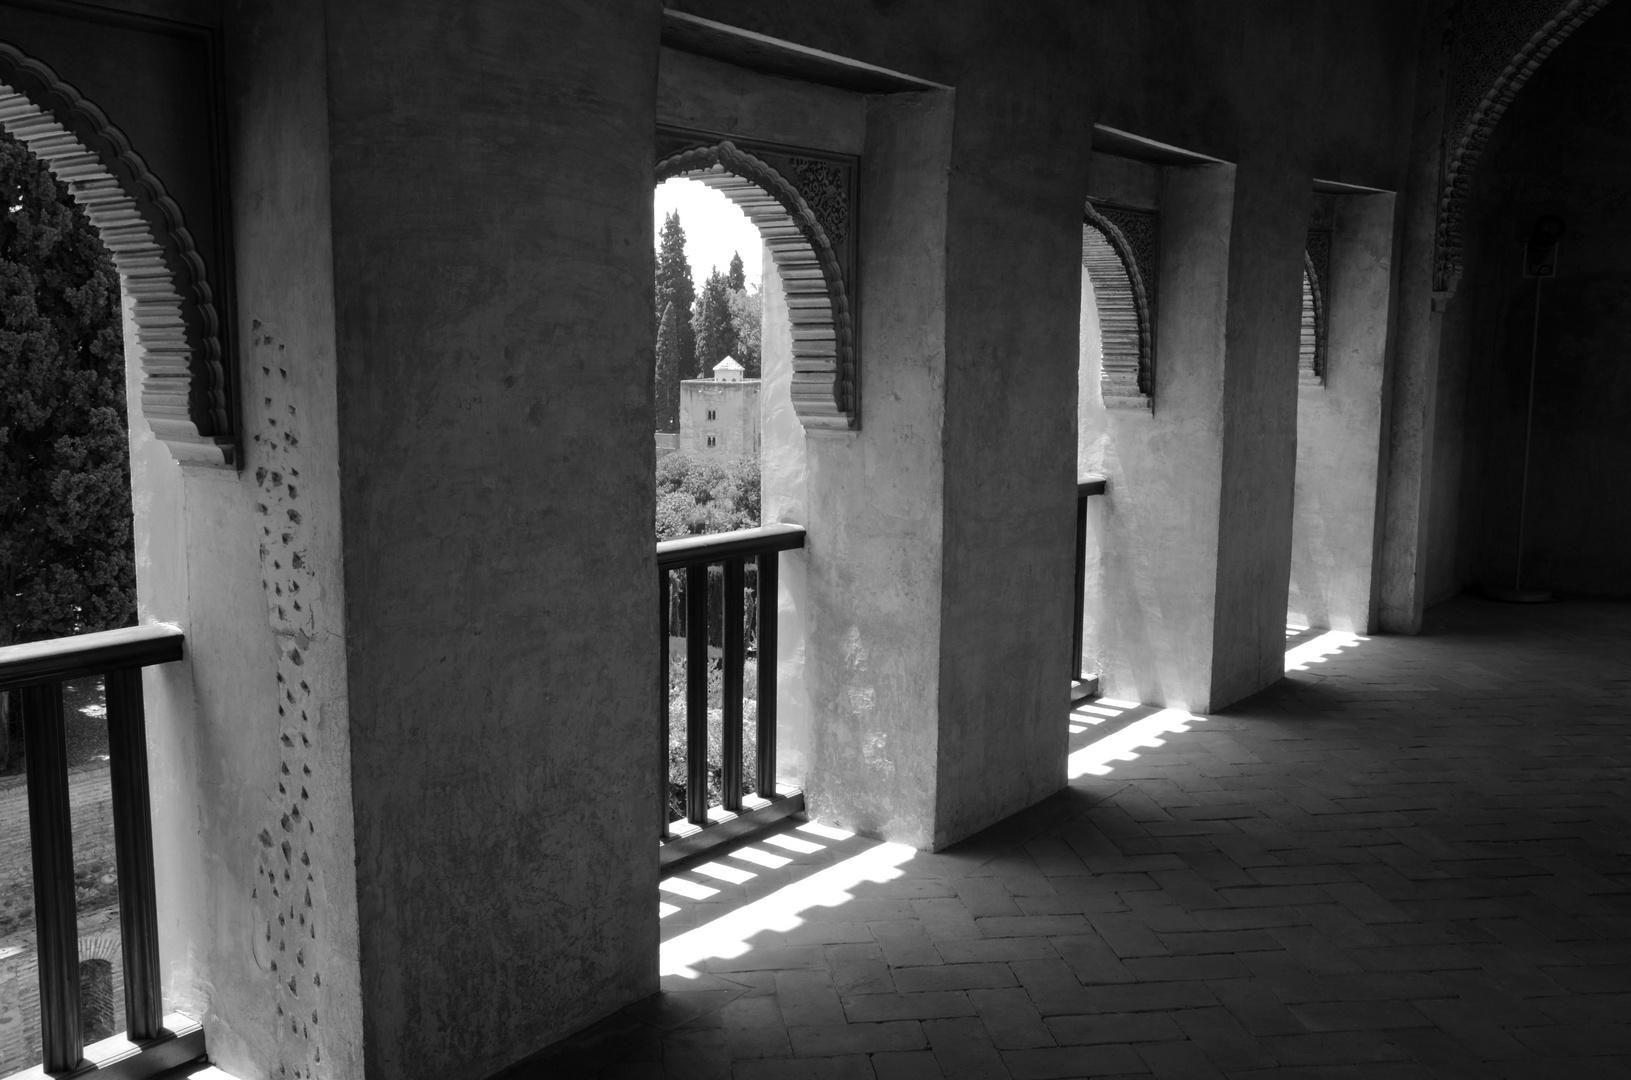 Arkadengang in der Alhambra